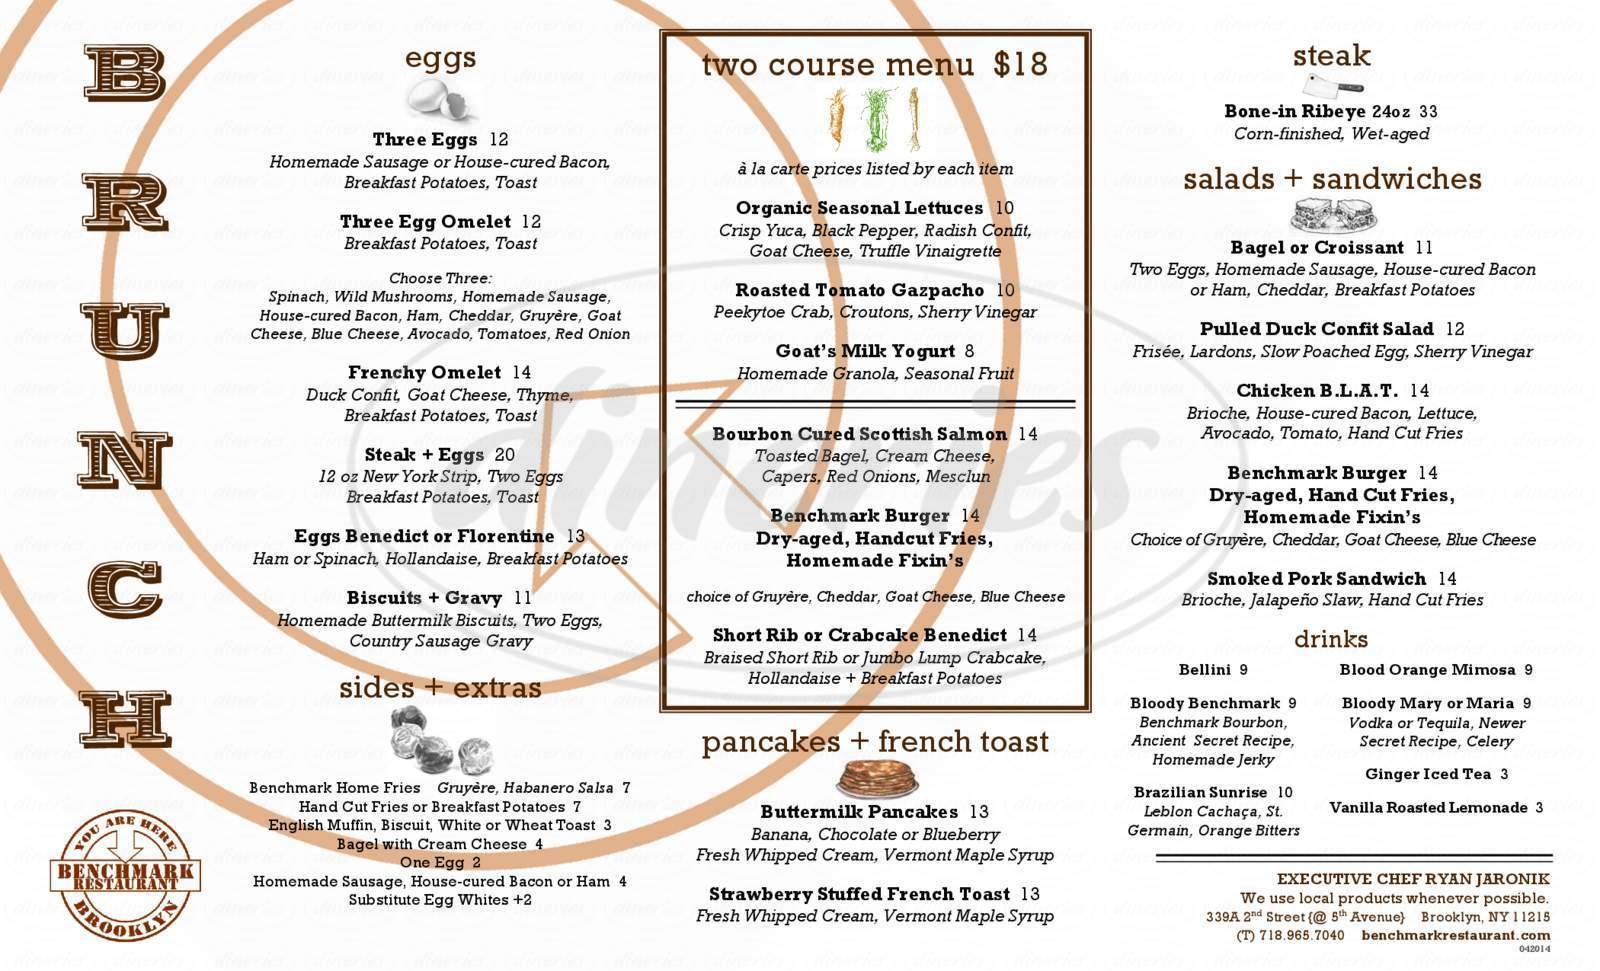 menu for Benchmark